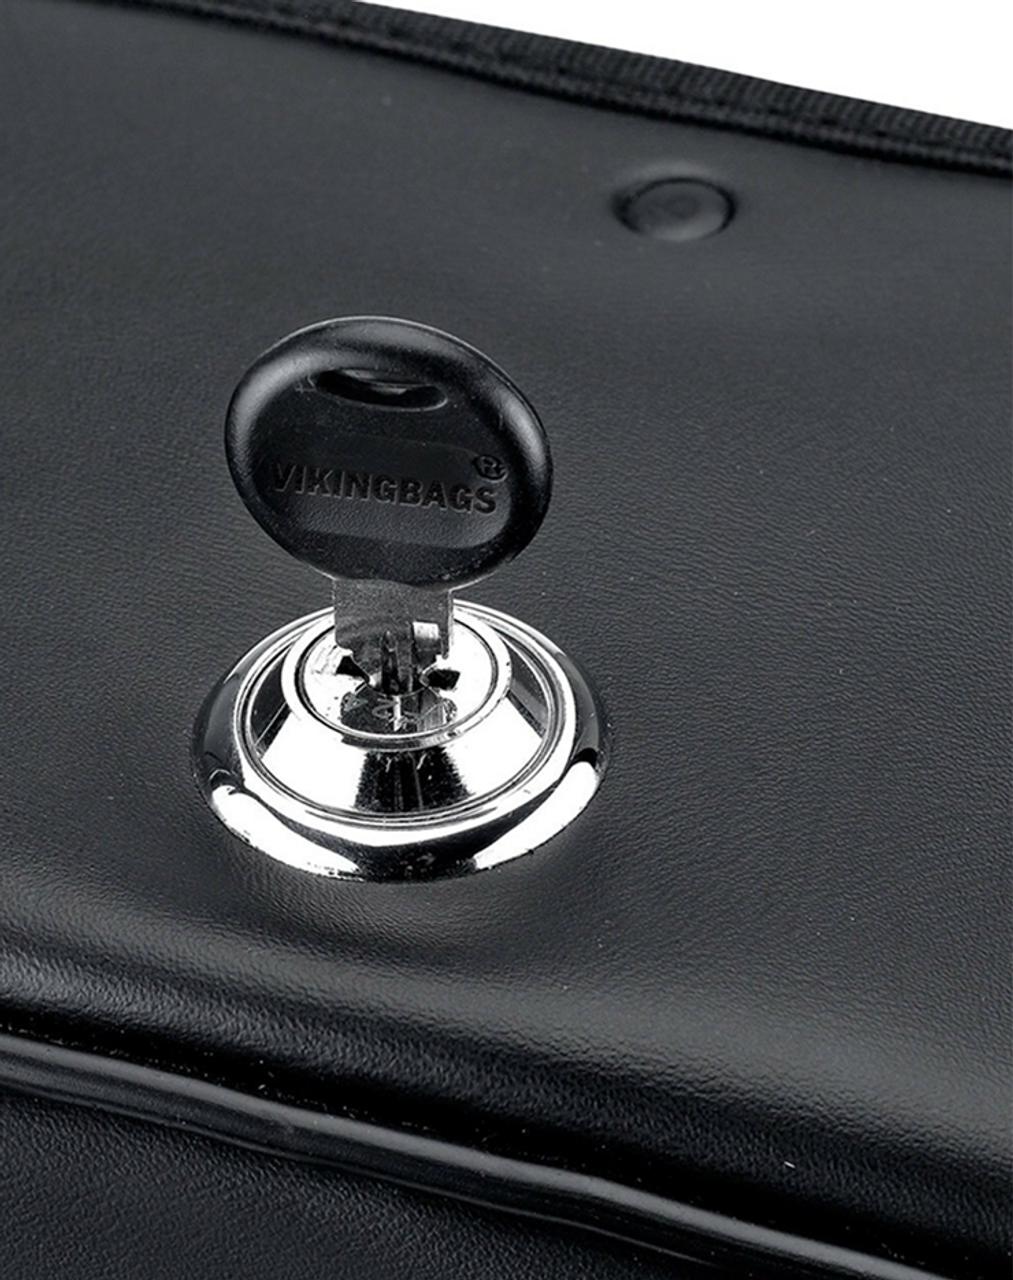 Triumph Thunderbird Charger Slanted Medium Motorcycle Saddlebags Key Lock View